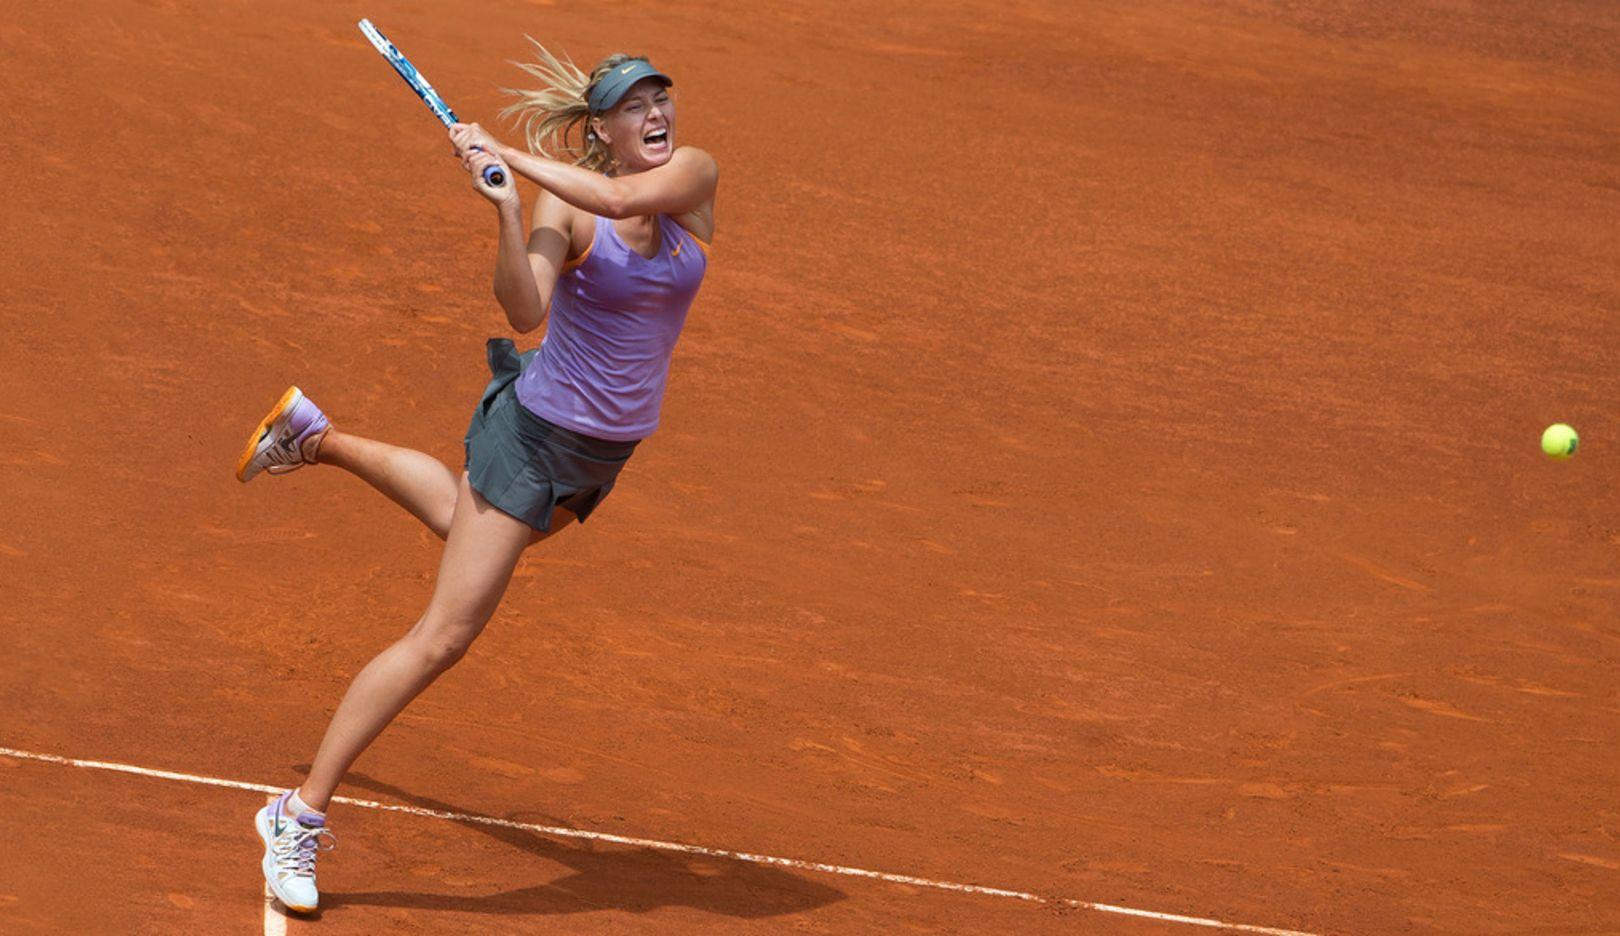 Maria Sharapova, Markenbotschafterin, Tennisspielerin, WTA Championships, 2014, Porsche AG